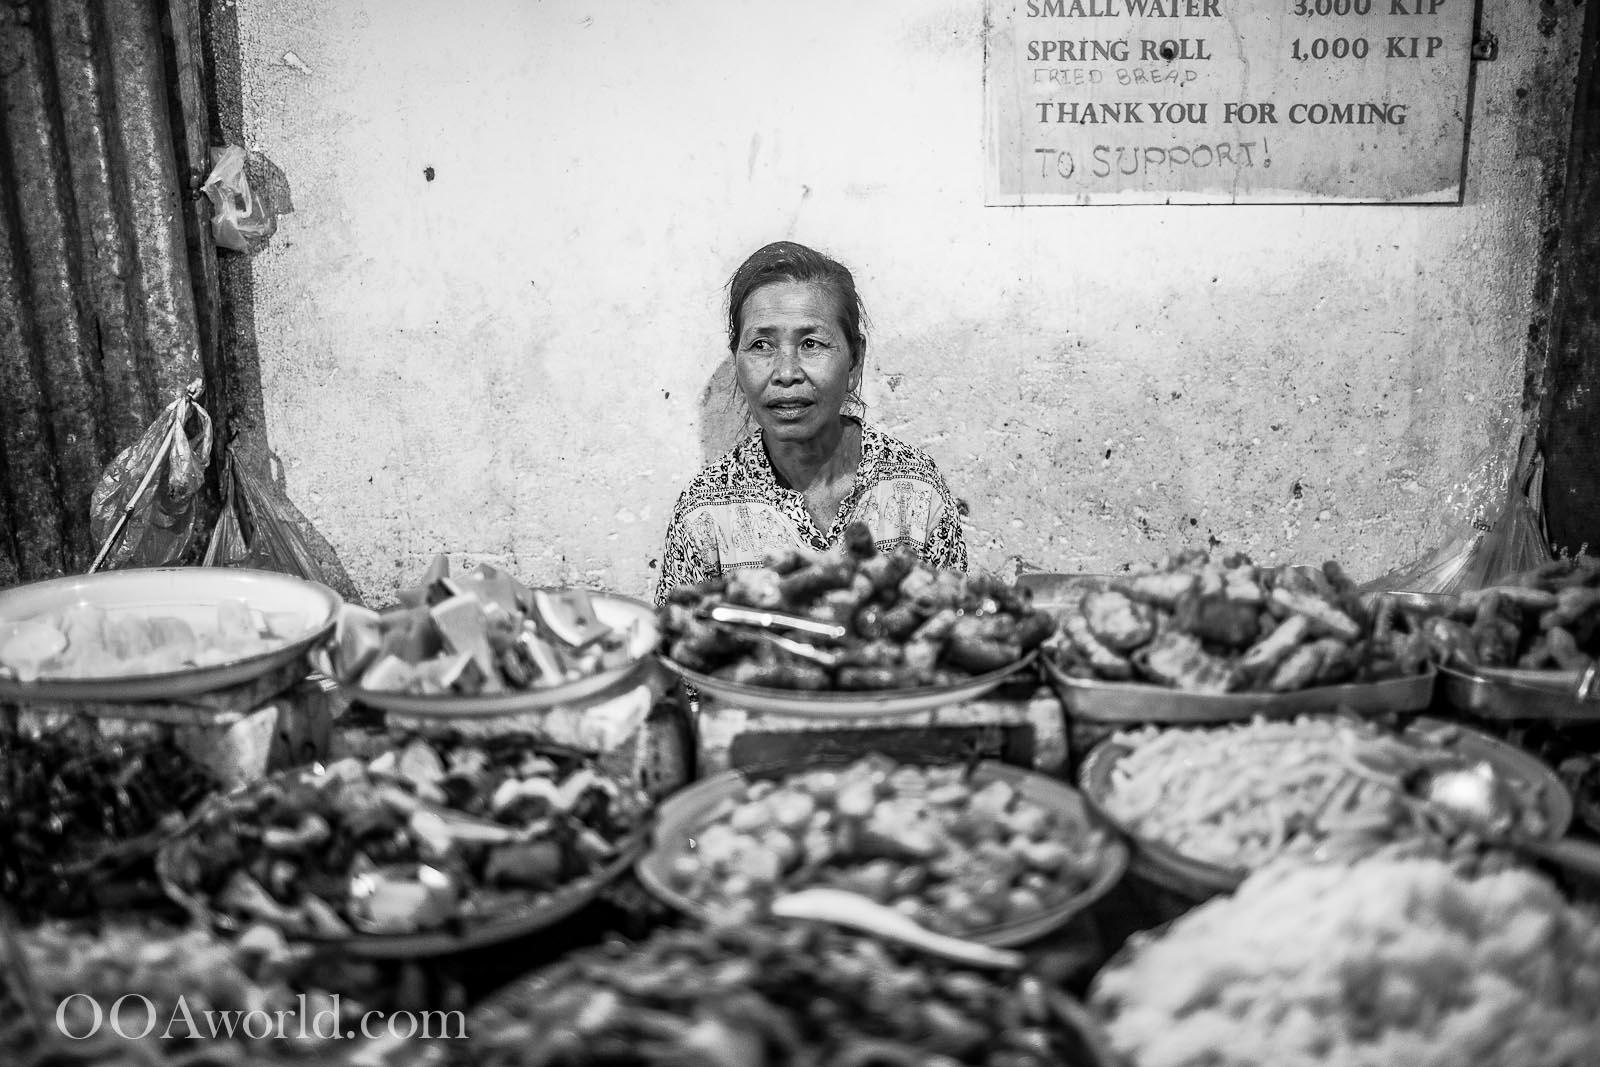 Luang Prabang Night Market Photo Ooaworld